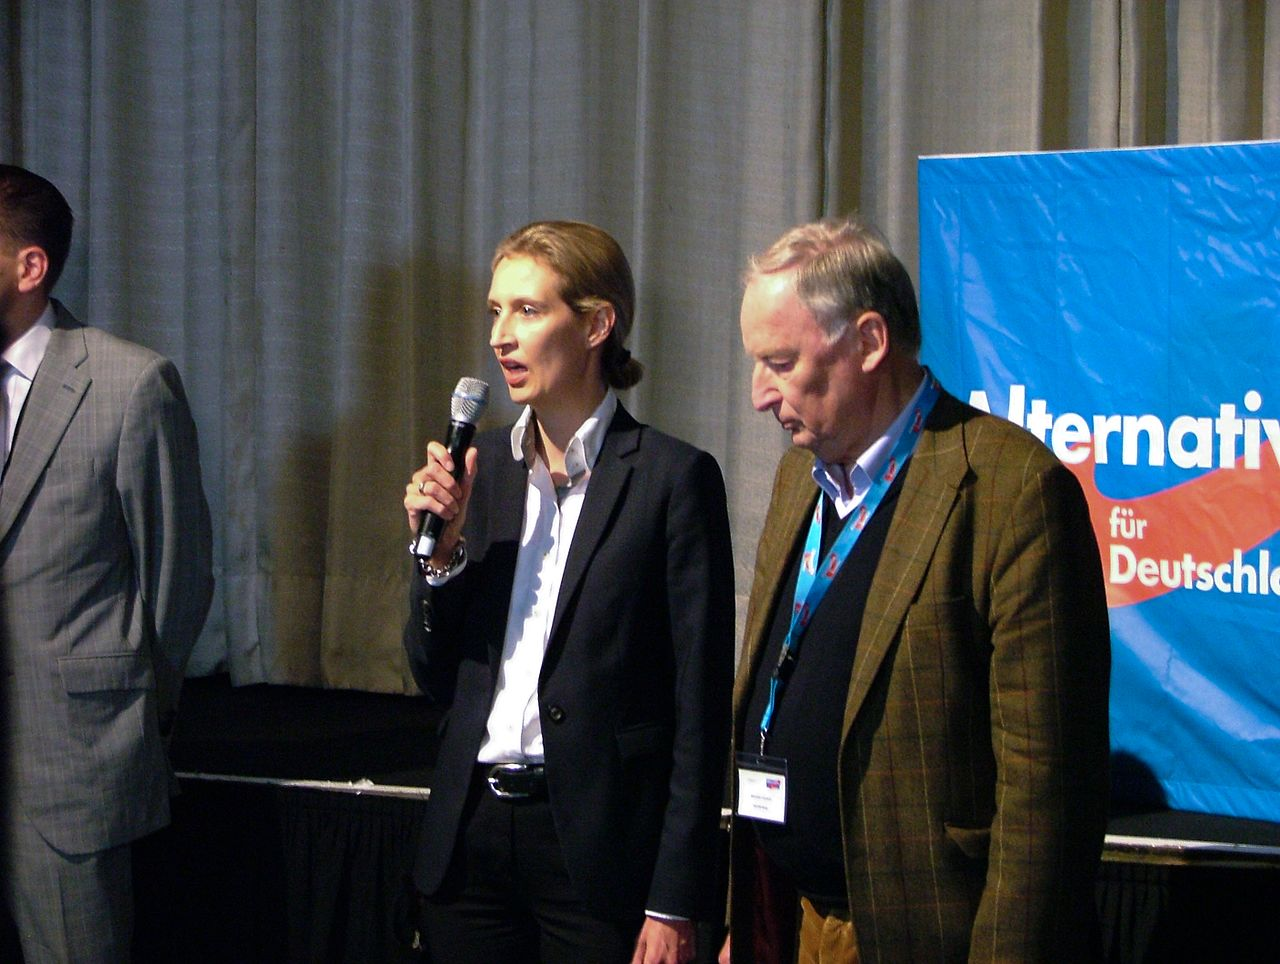 2017-04-23 AfD Bundesparteitag in Köln -67.jpg